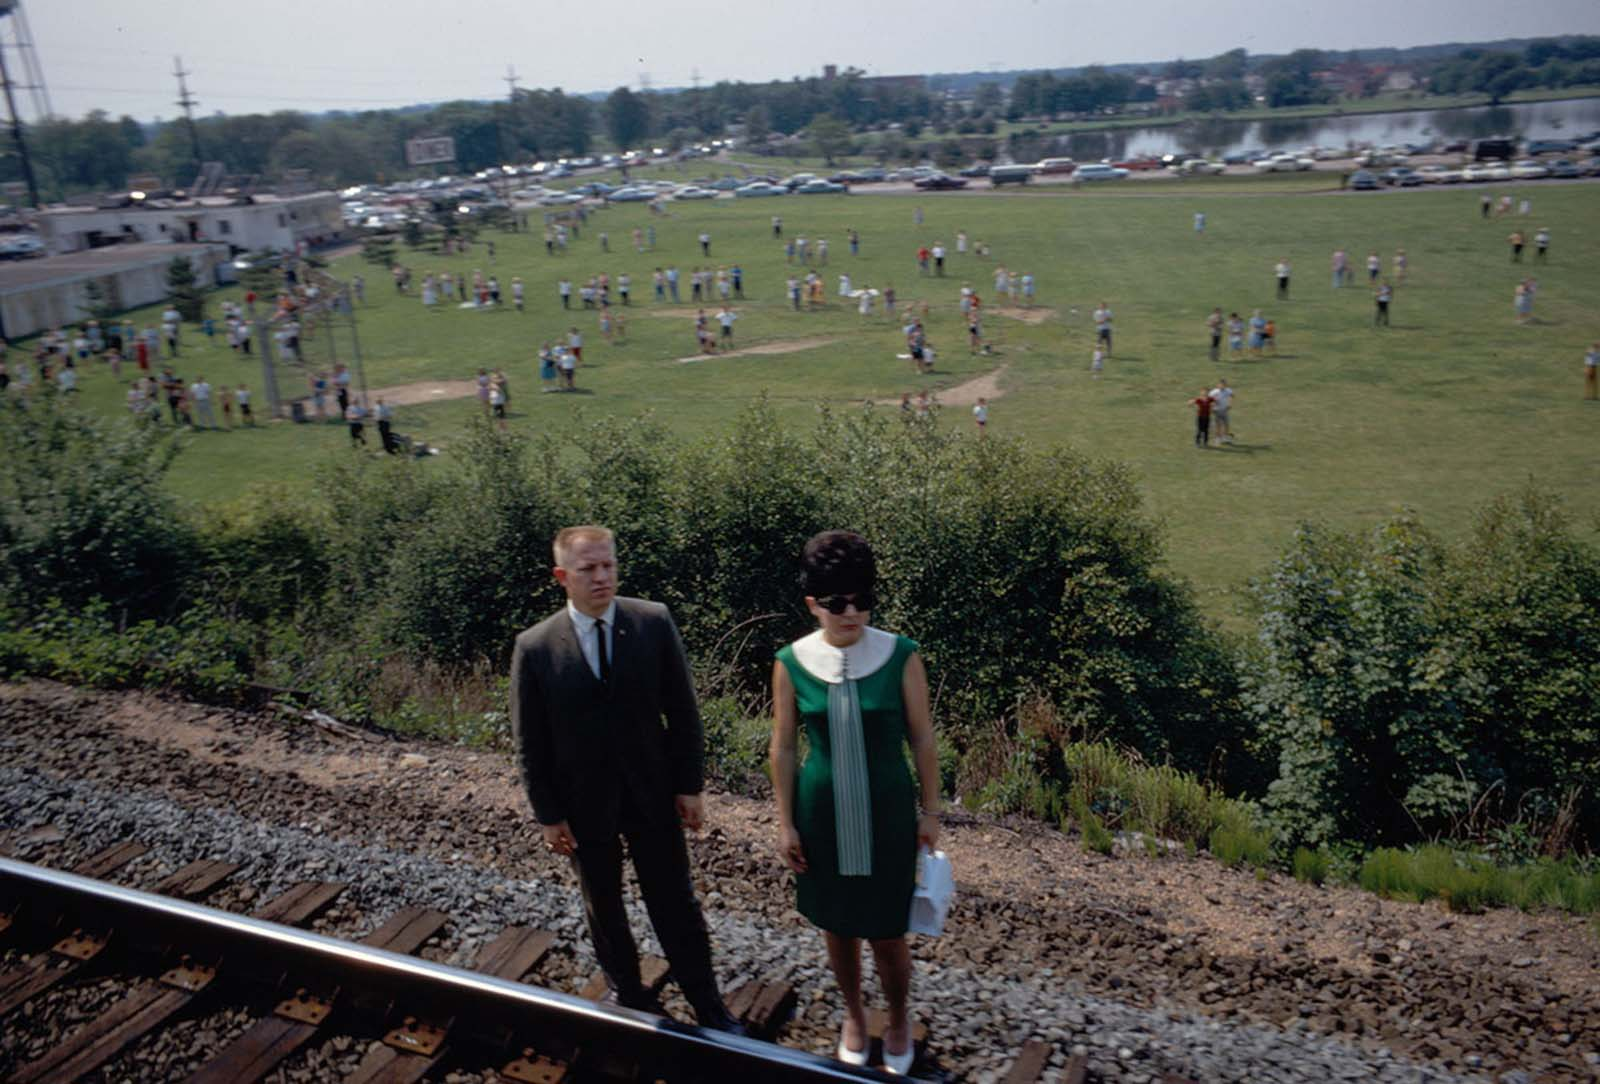 Bristol, Pennsylvania, June 8, 1968.